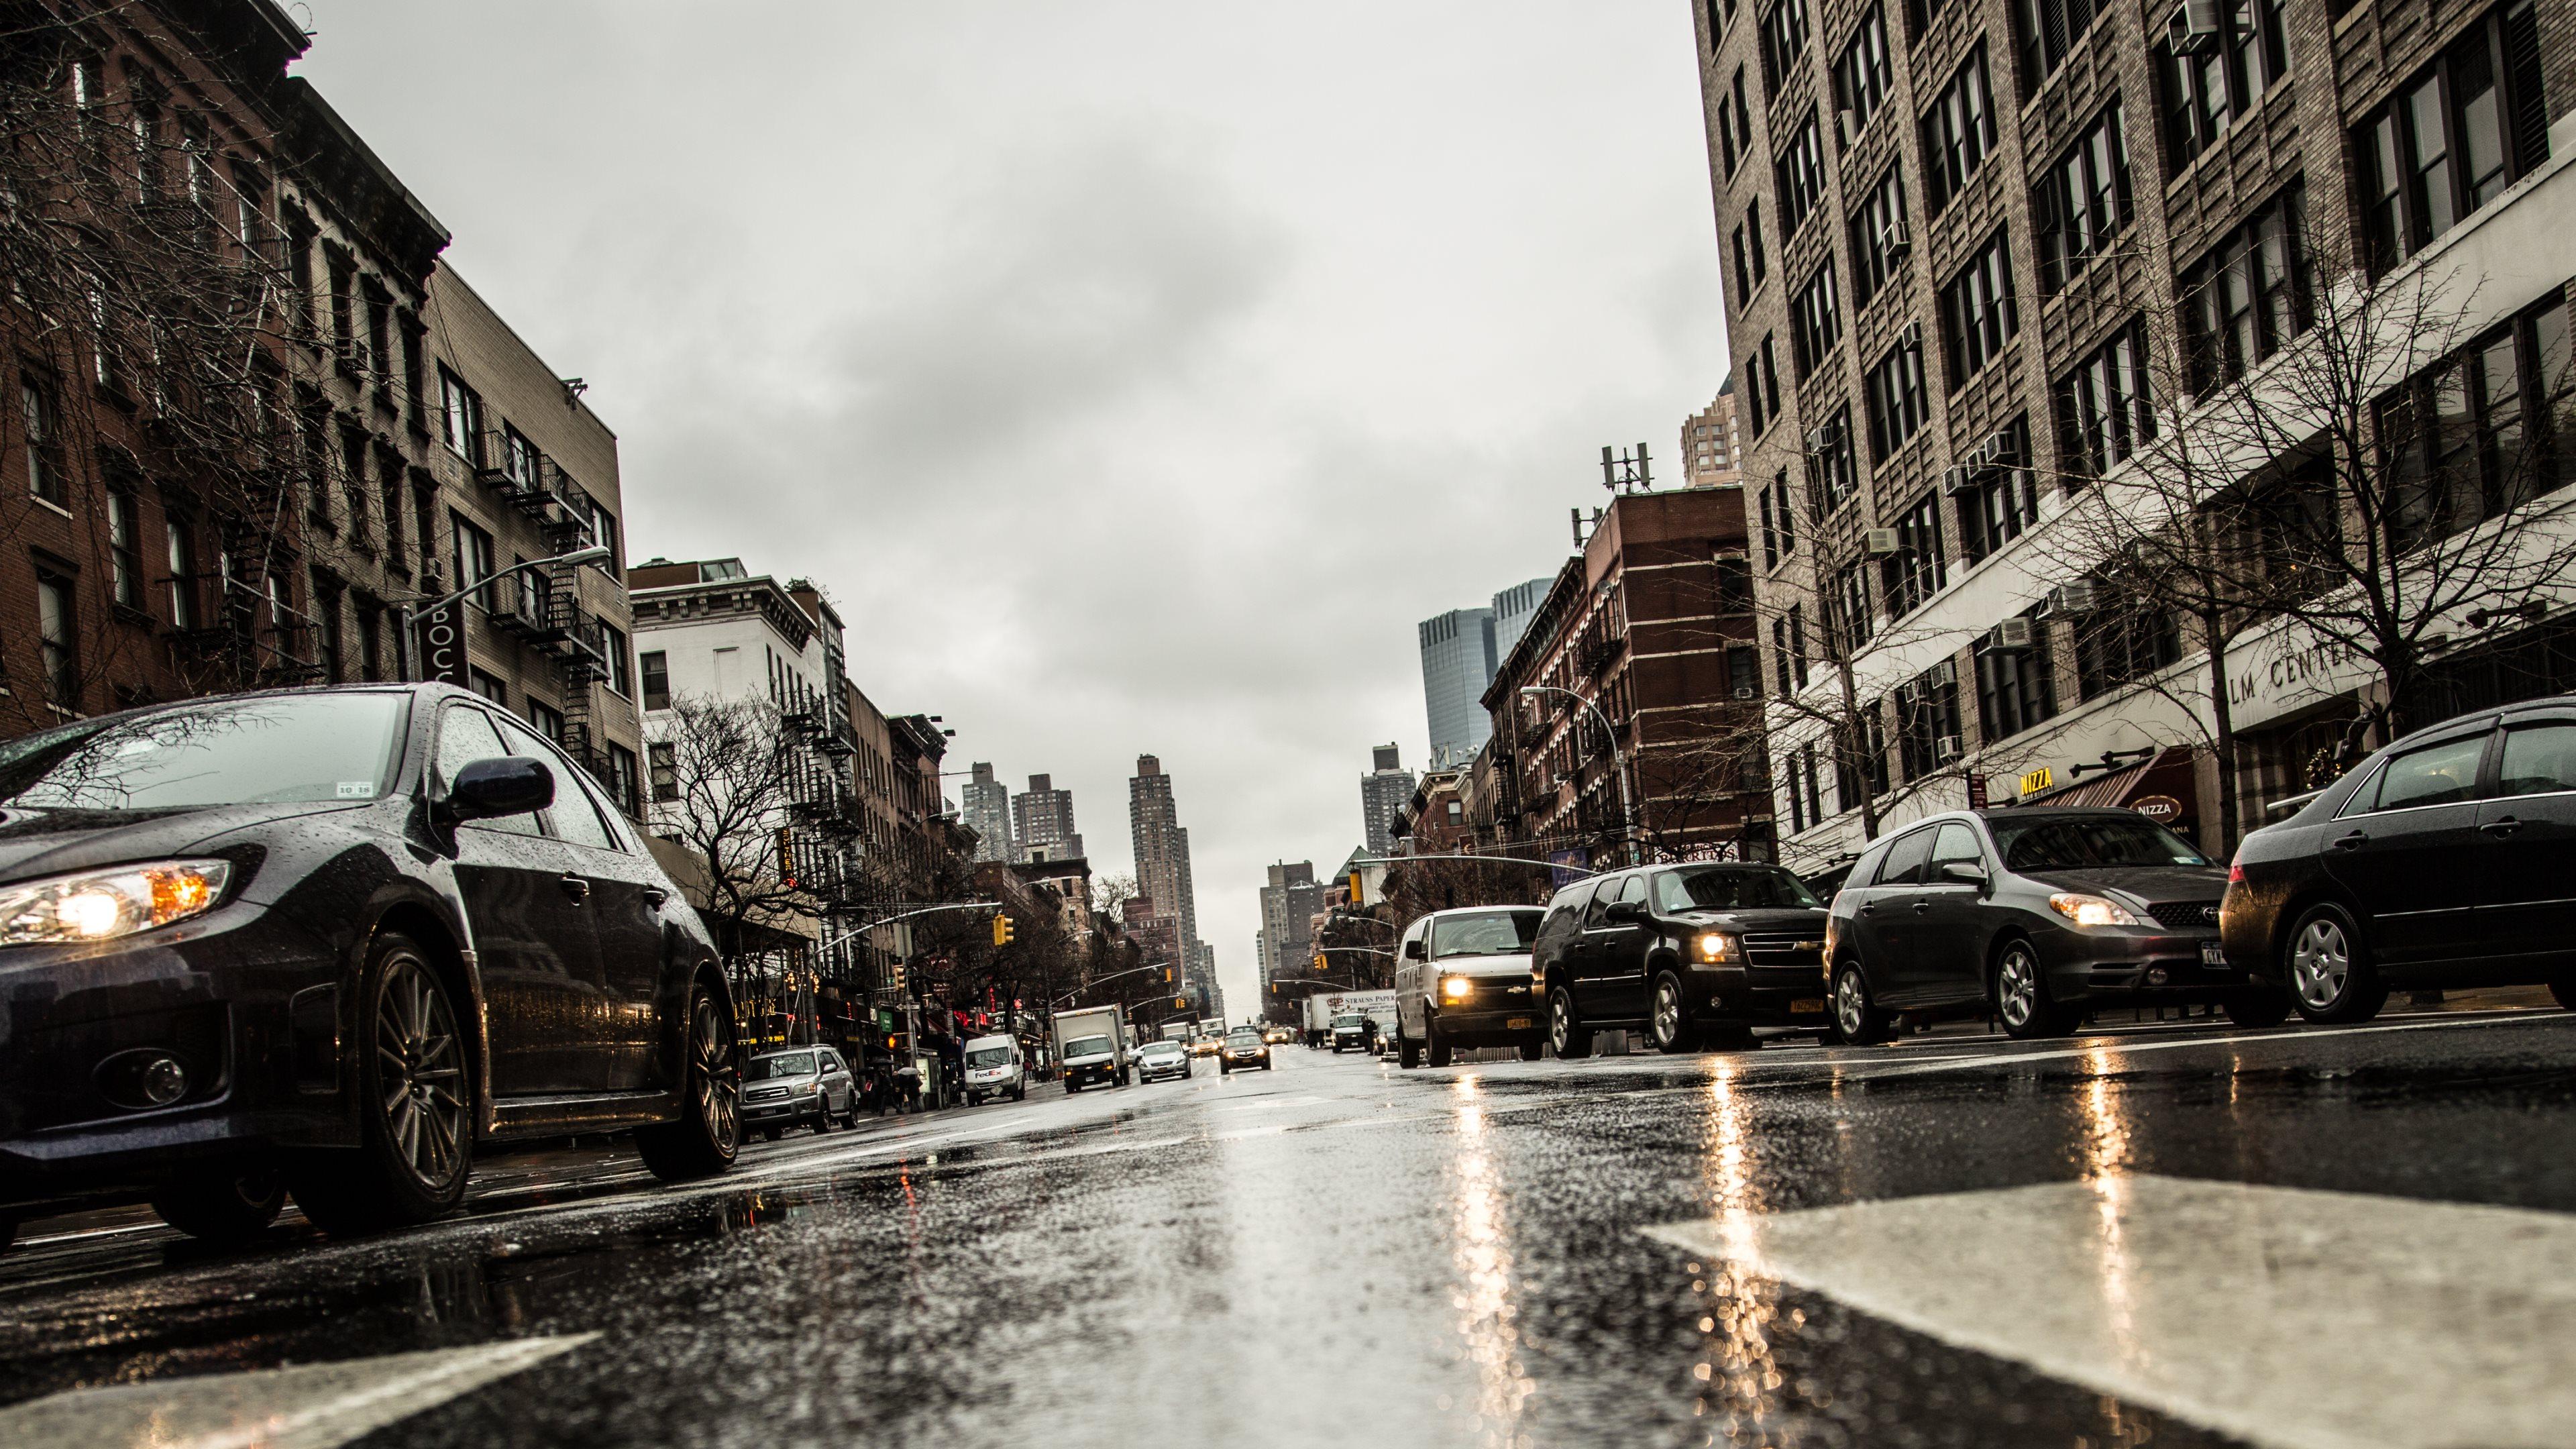 New york wallpaper 1080p for Wesley motors minot nd